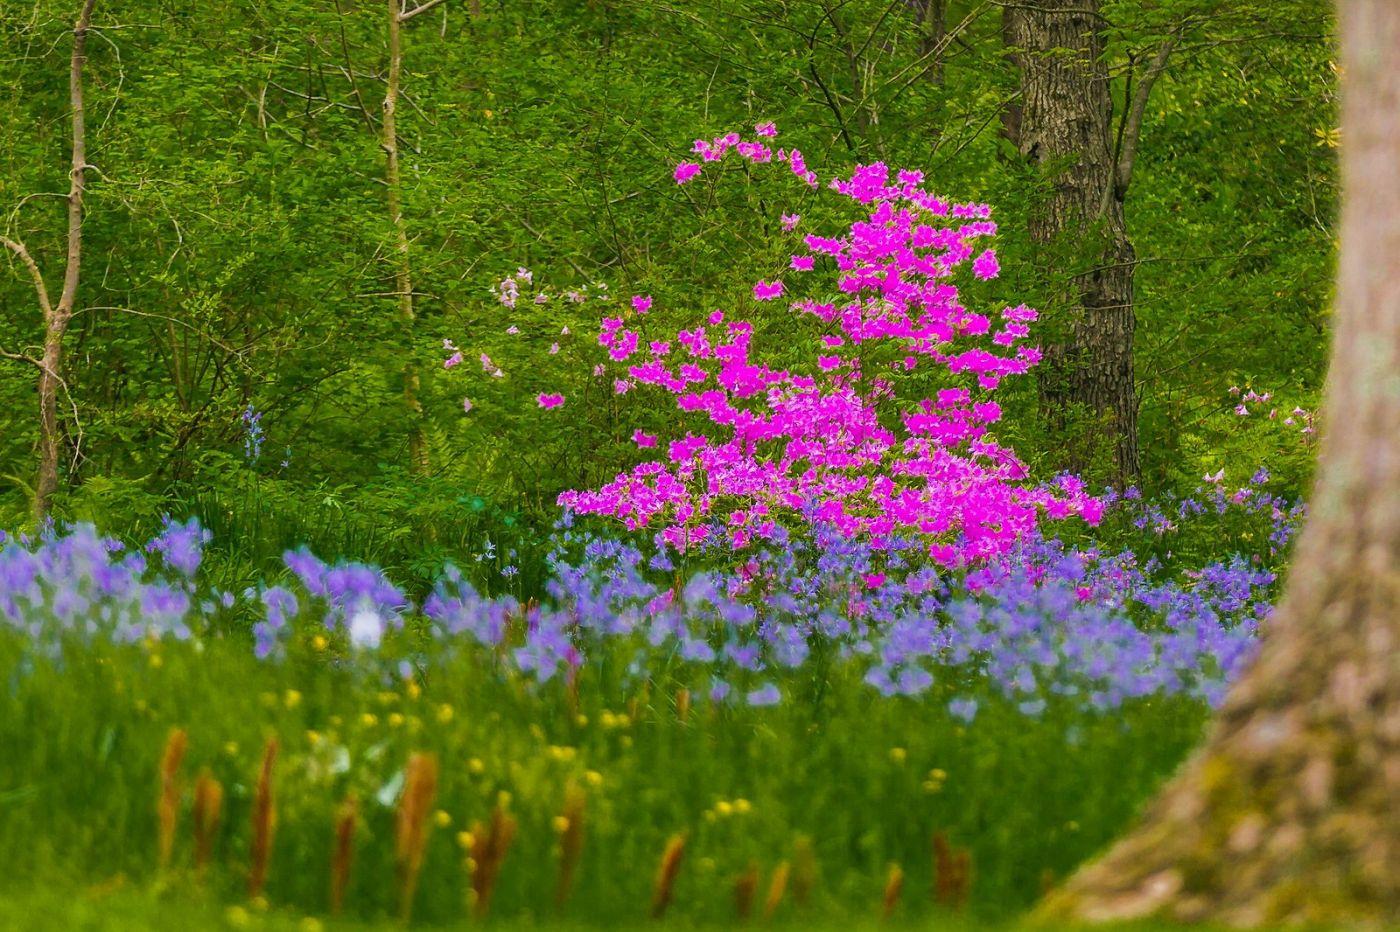 Chanticleer花园,有梦想的季节_图1-39